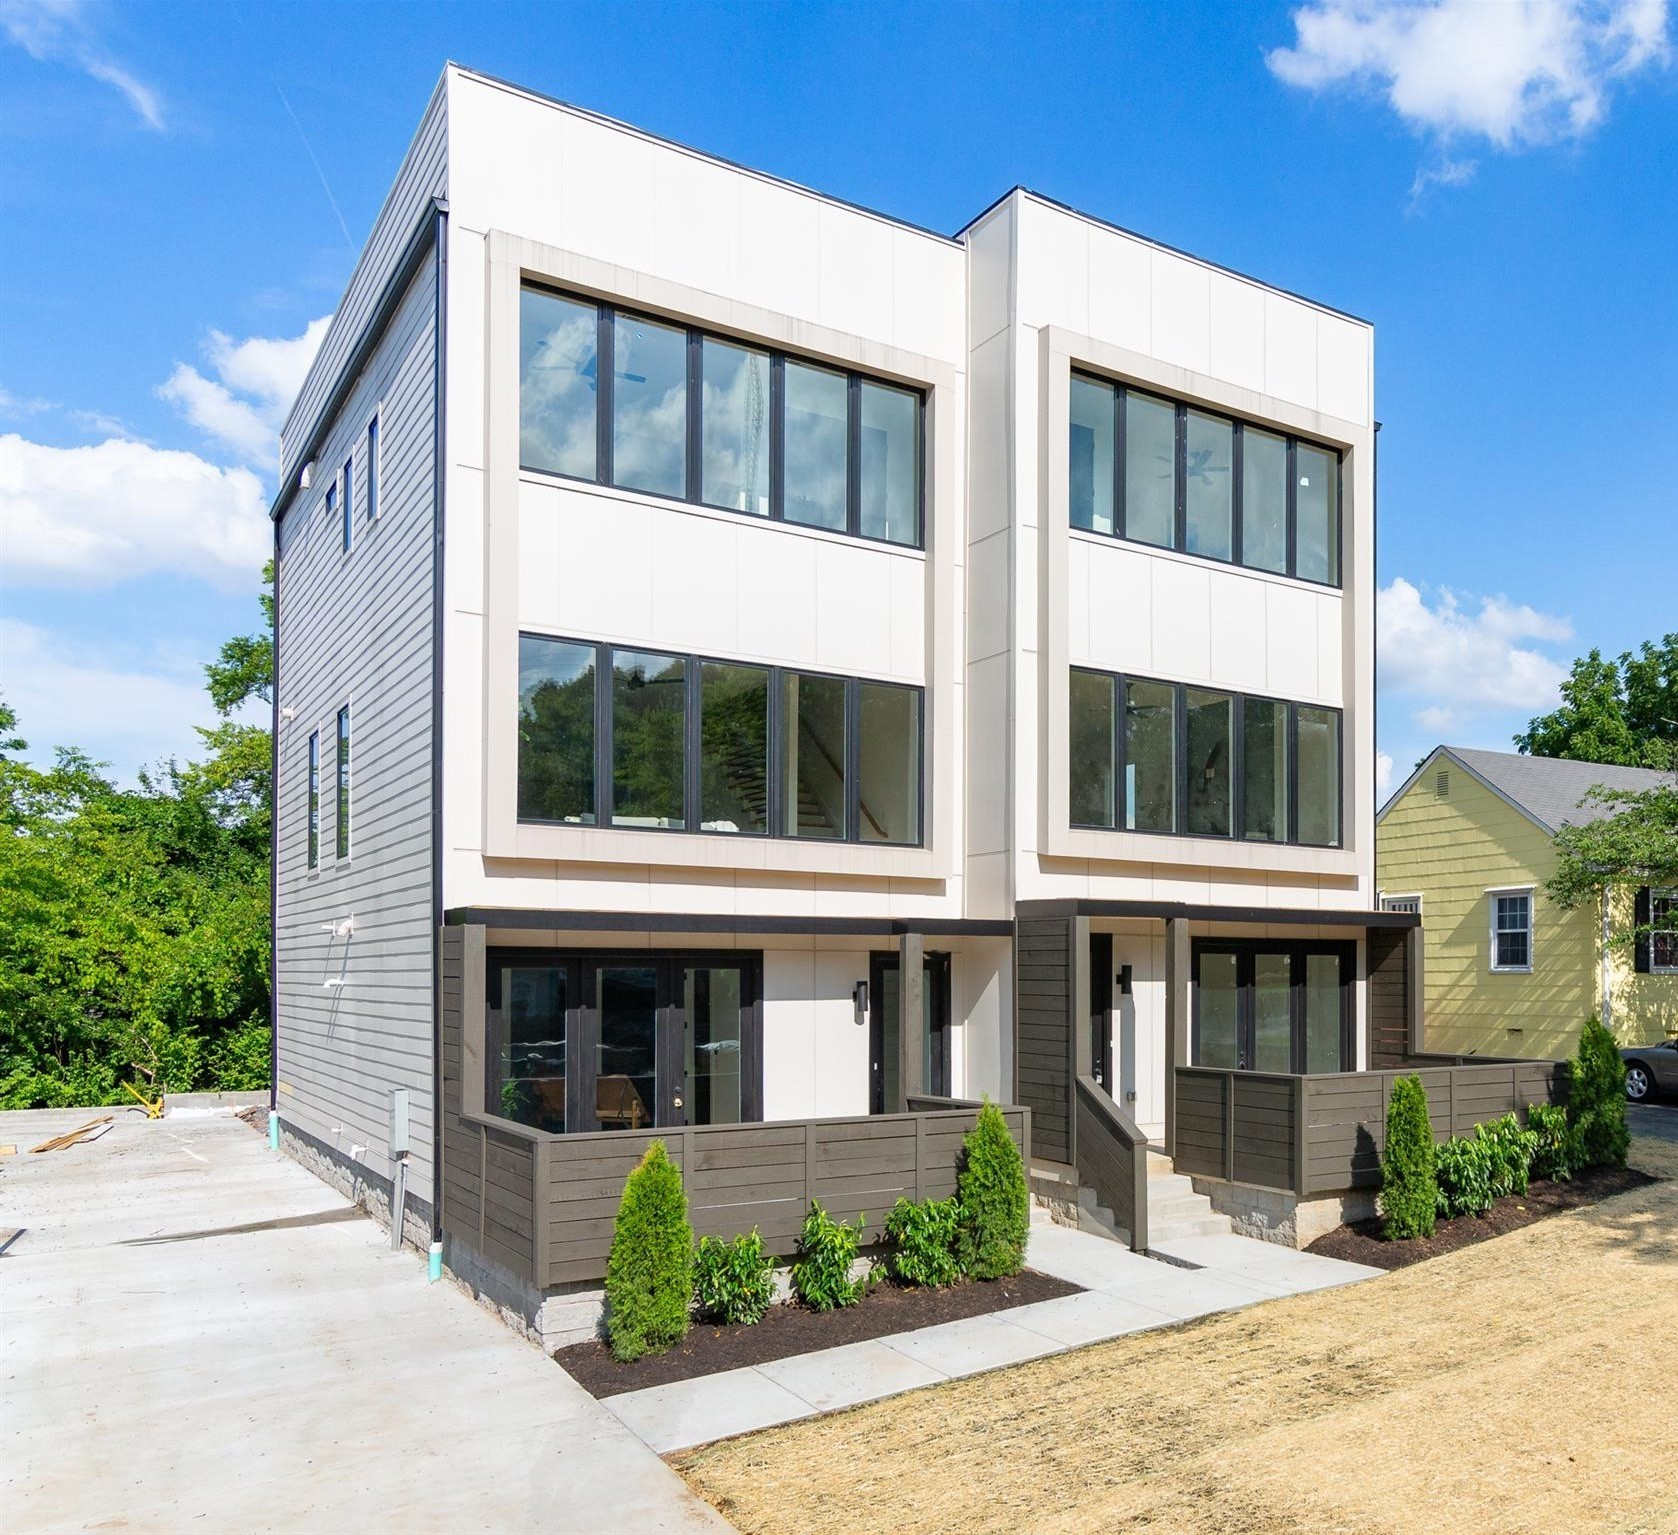 120 Oceola Ave Ii Real Estate Listings Main Image